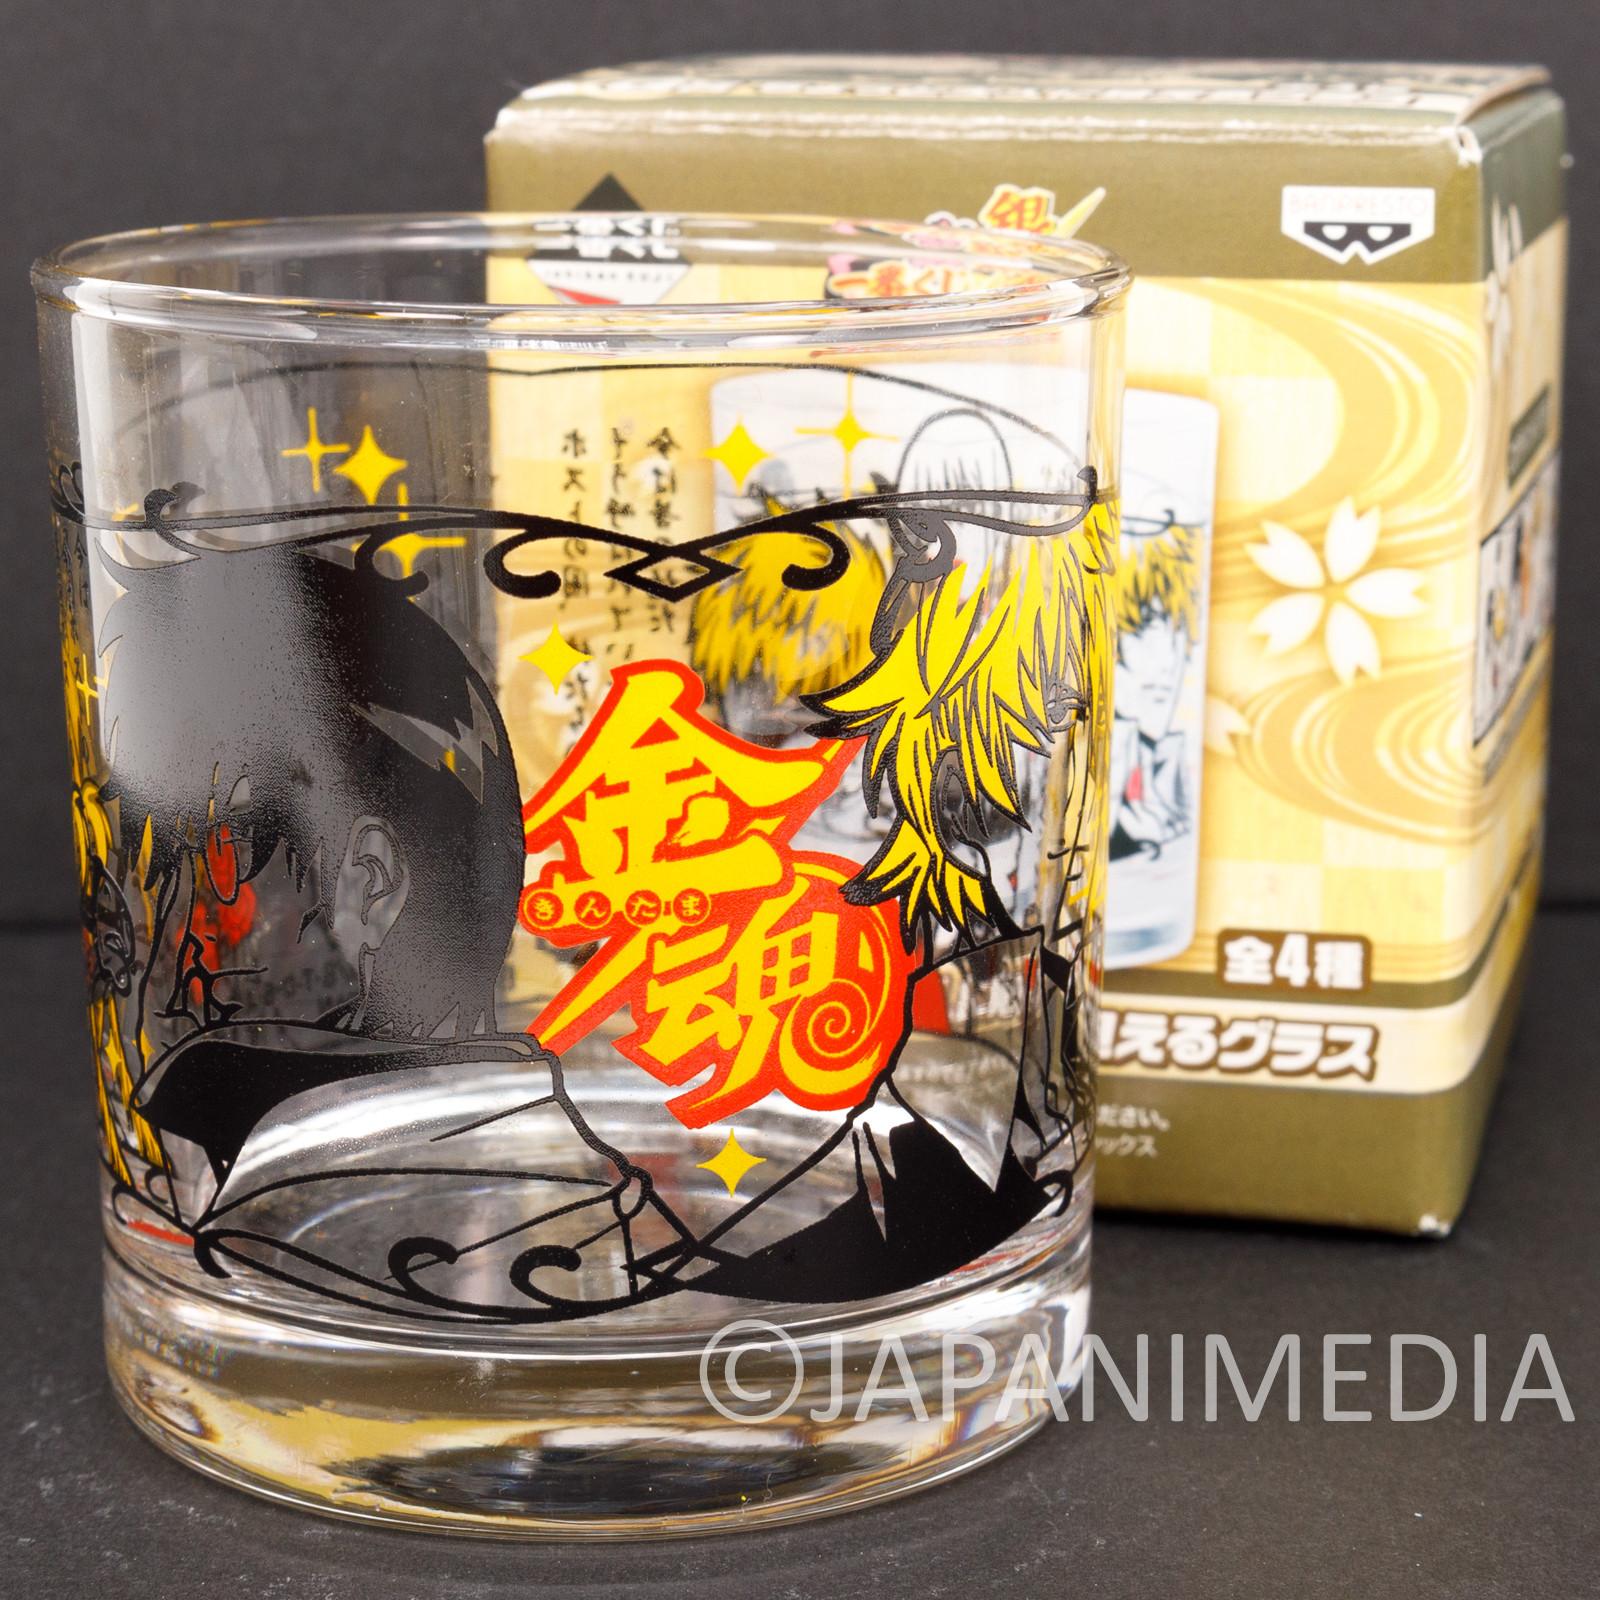 Gintama Rock Glass Kintama arc ver. JAPAN ANIME MANGA SHONEN JUMP